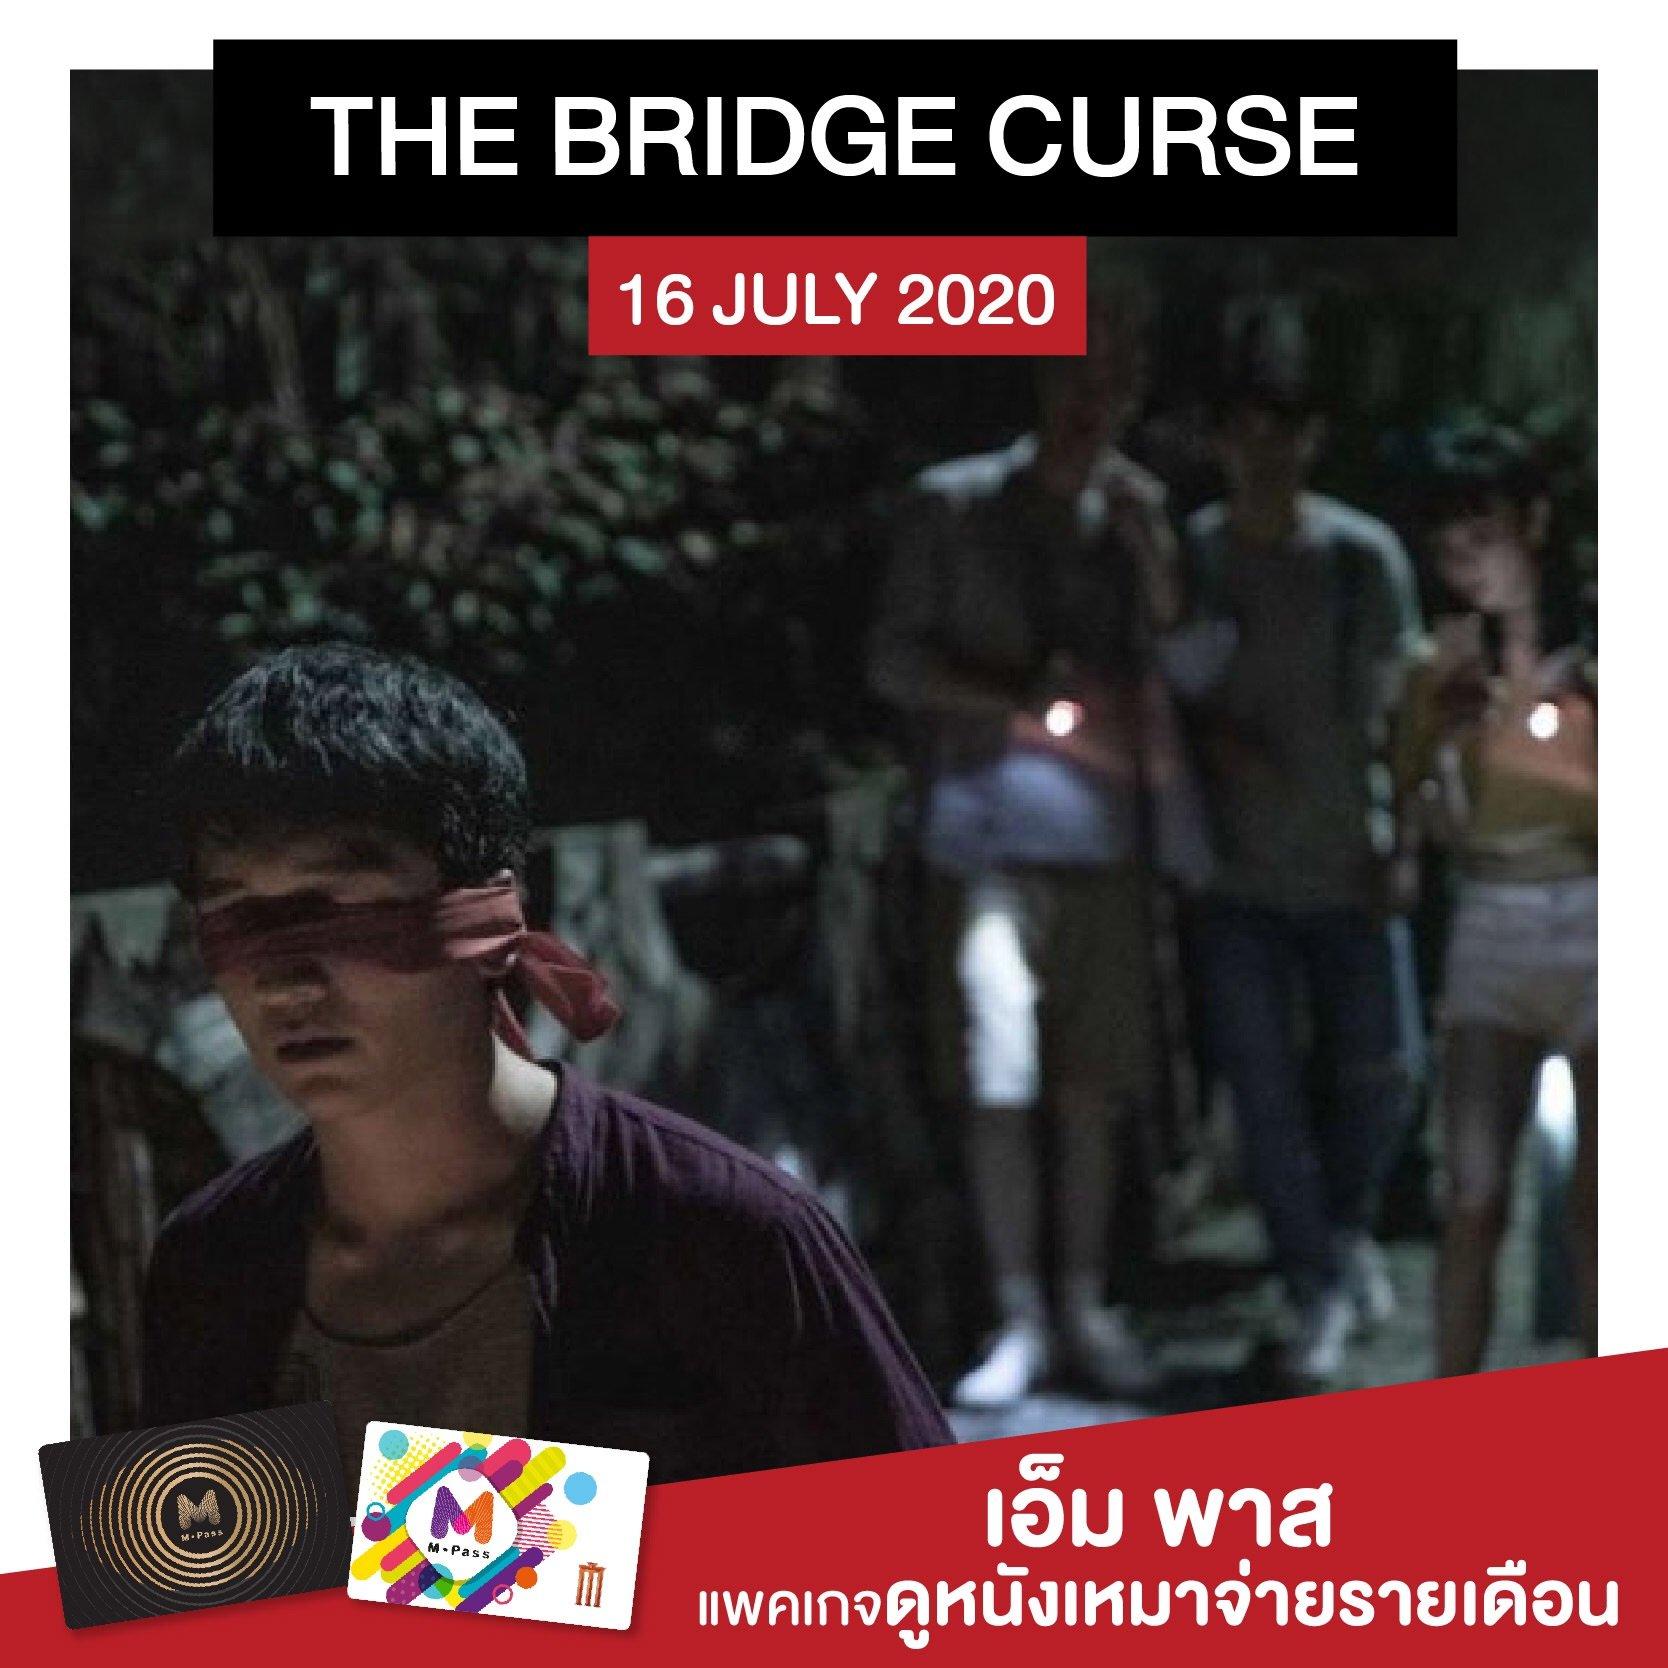 thebridgecurse